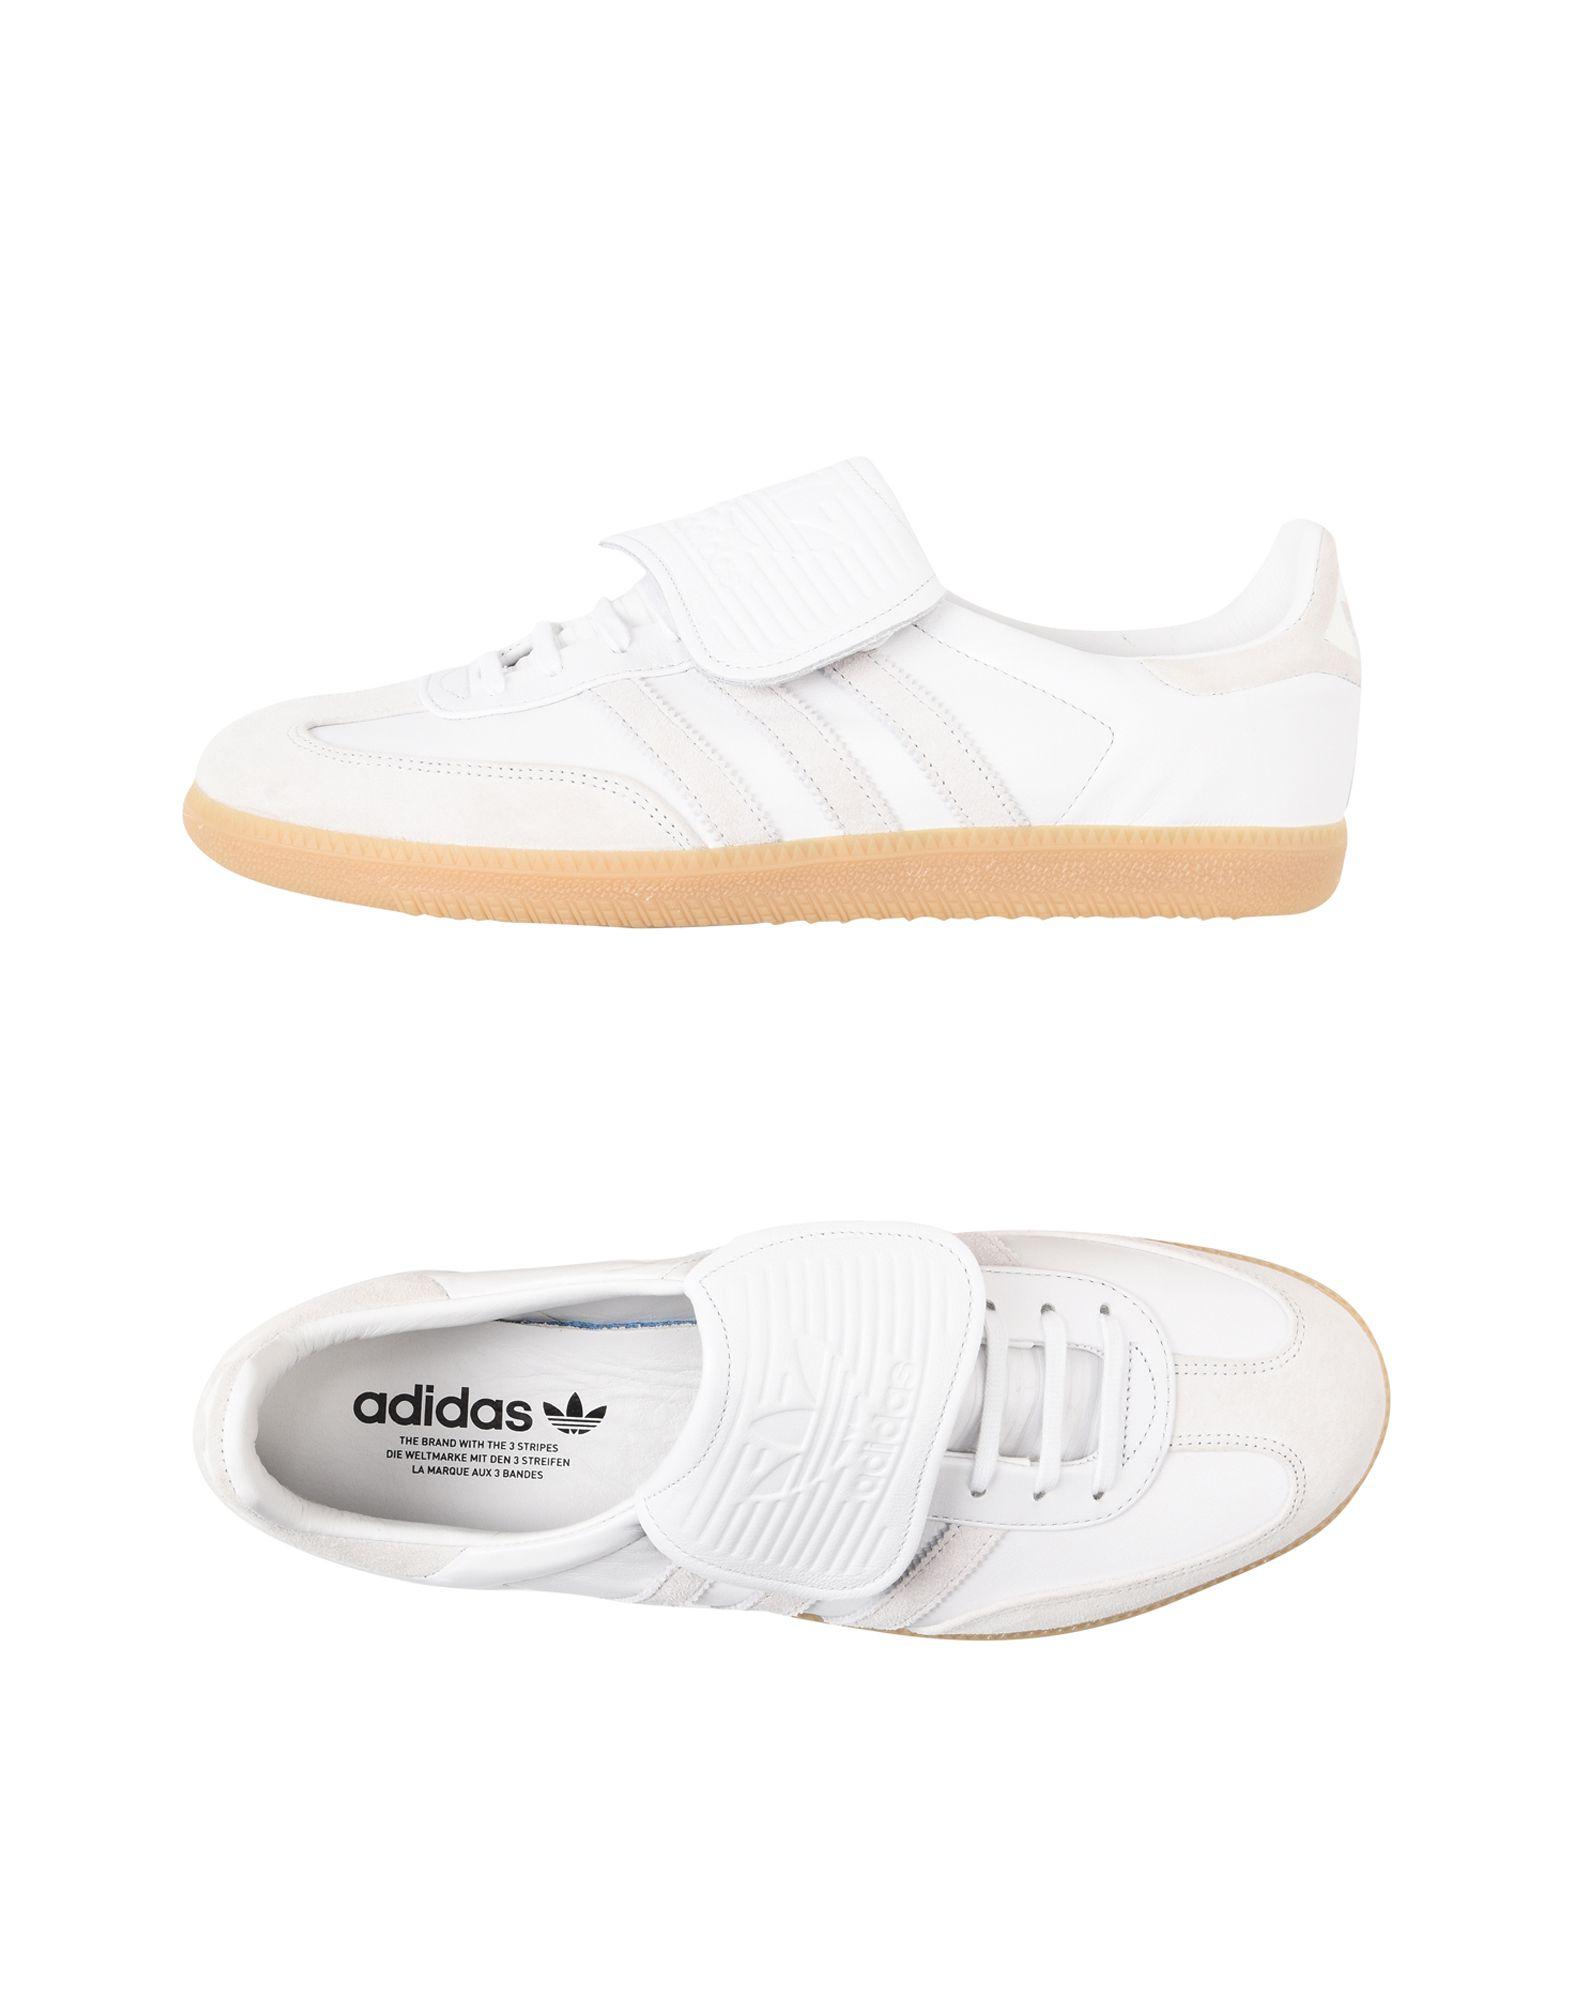 Adidas Originals Samba Recon Lt  11533606JI Gute Qualität beliebte Schuhe